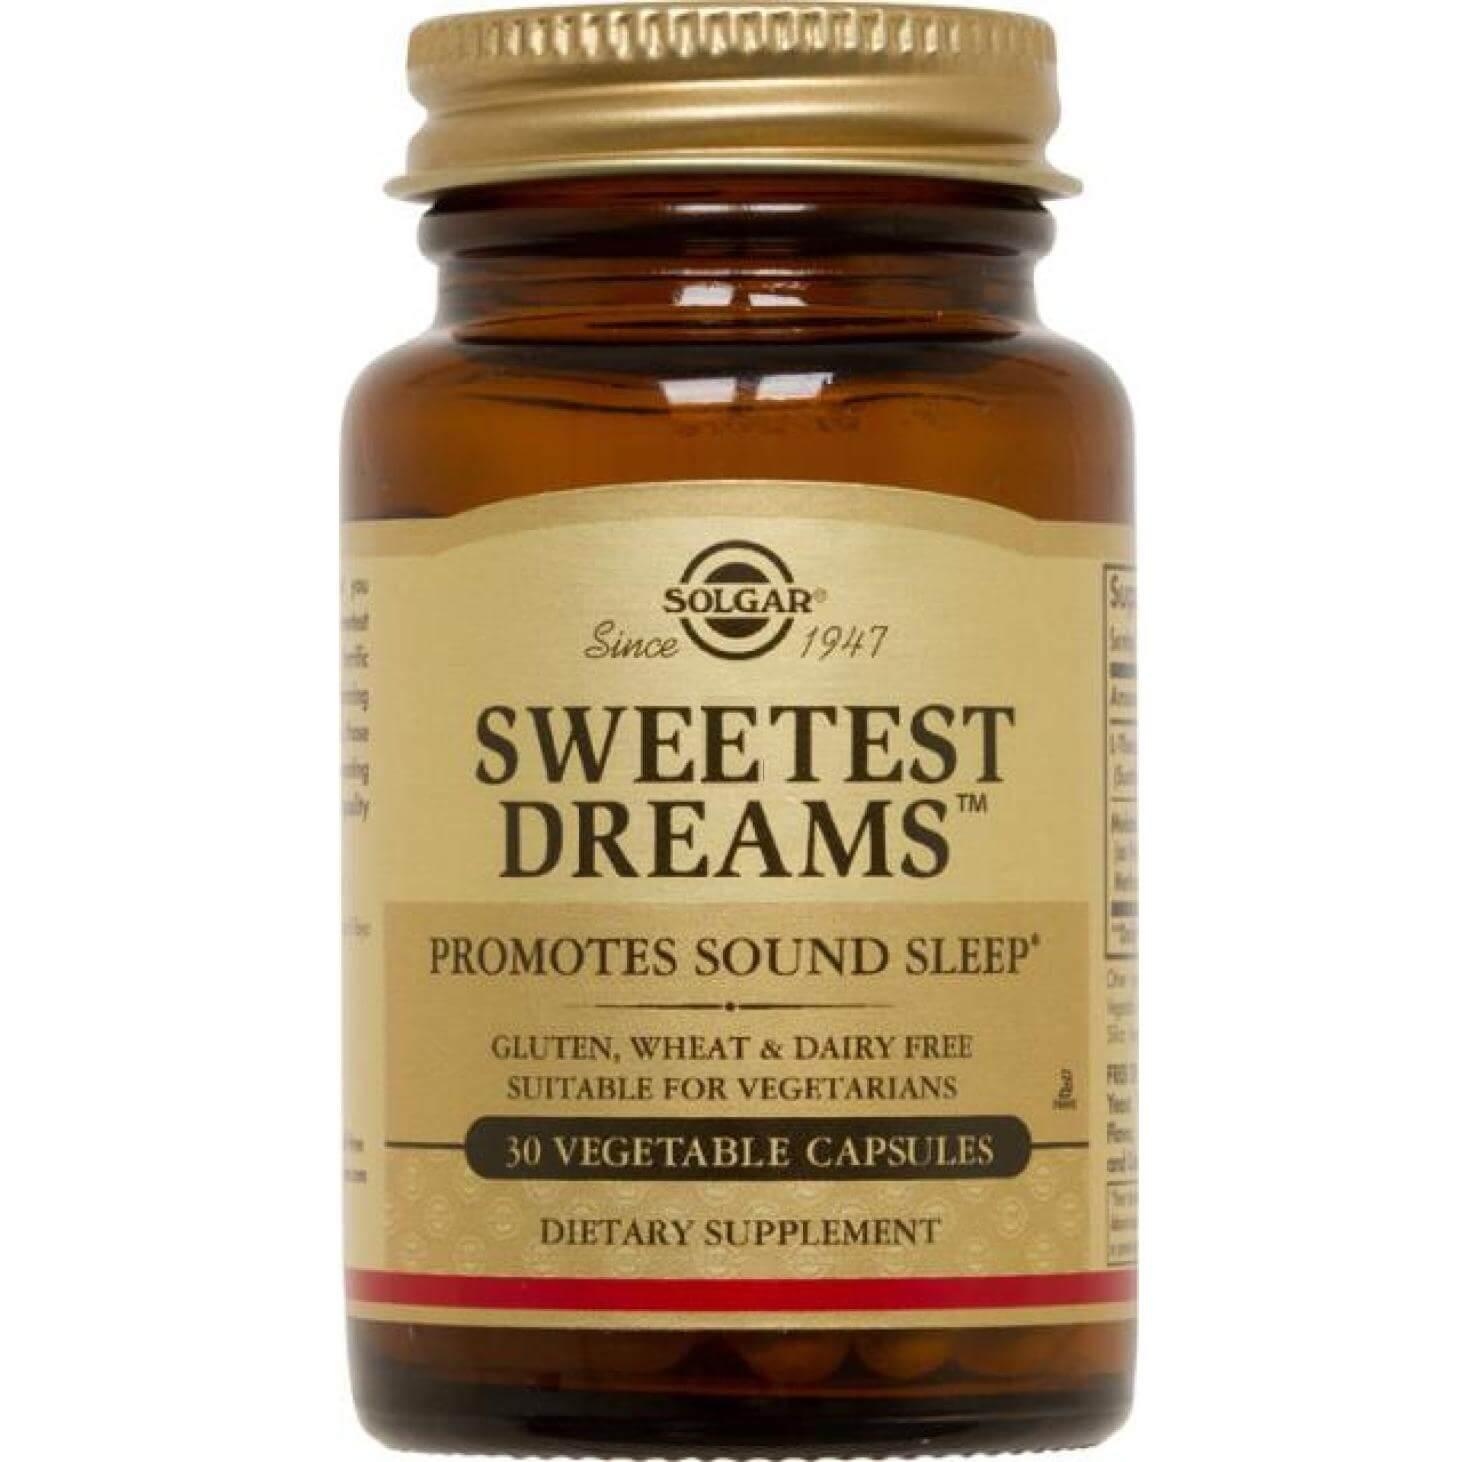 Solgar Sweetest Dreams Συμπλήρωμα Διατροφής που Βοηθά σε Περιπτώσεις Αϋπνίας, Ανησυχίας & Jet Lag30veg.cap